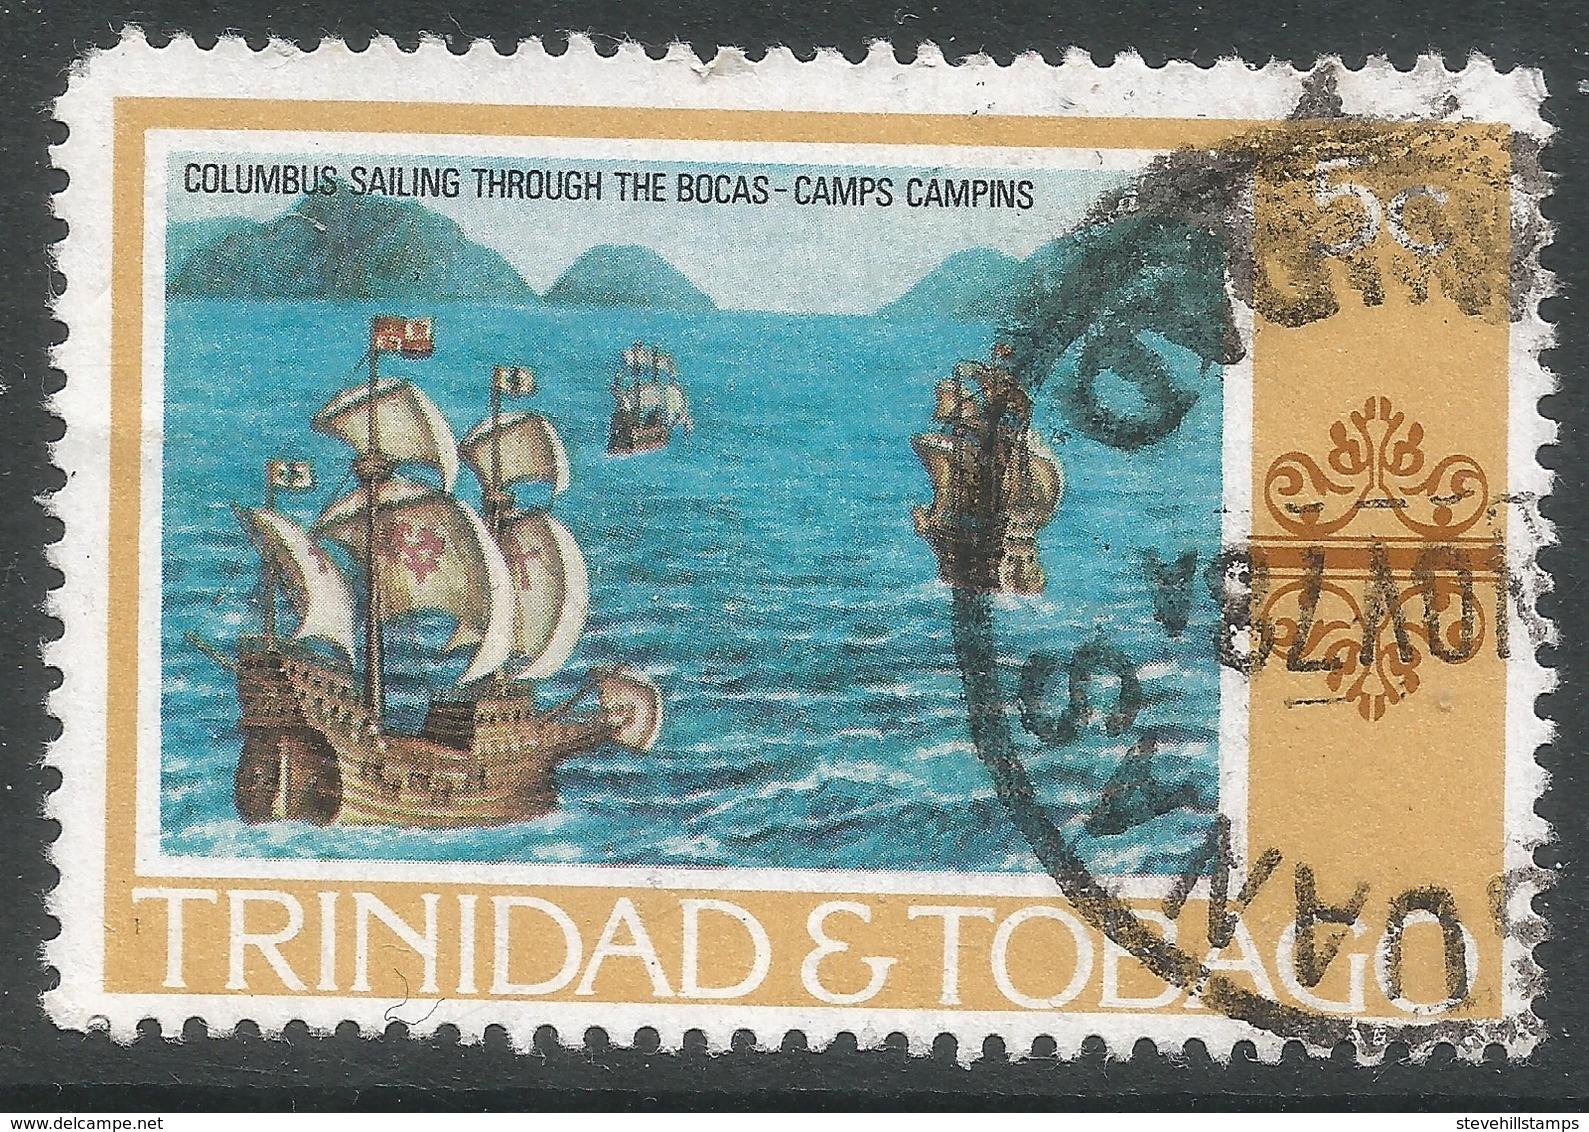 Trinidad & Tobago. 1976 Paintings, Hotels And Orchids. 5c Used. SG 479 - Trinidad & Tobago (1962-...)